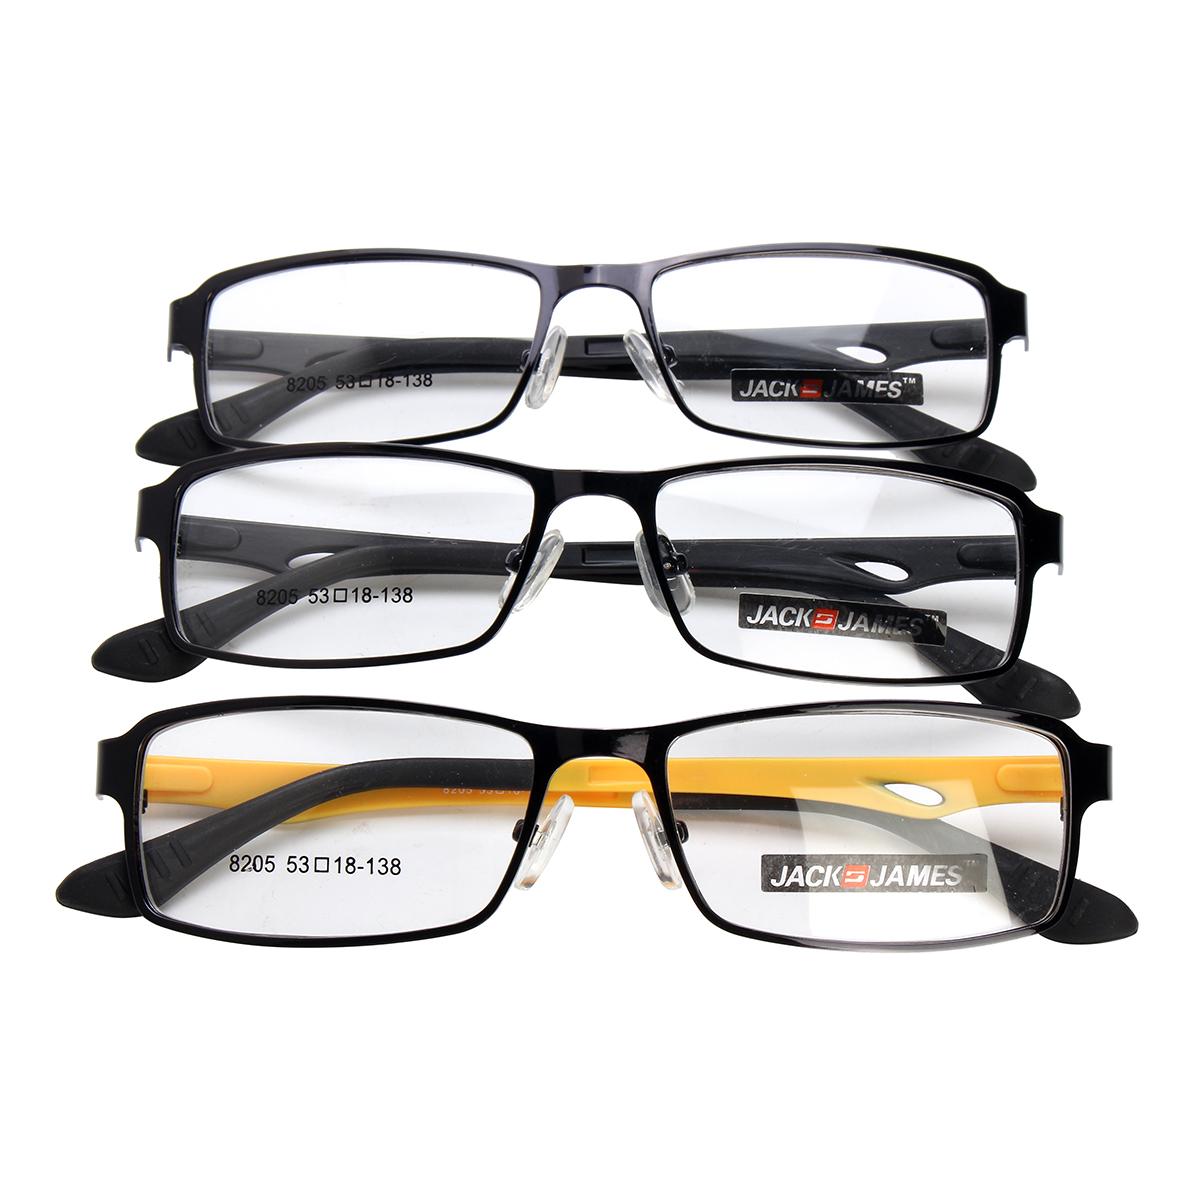 TR90 & Metal Eyeglass Frames Full Rim Eyewear Glasses R